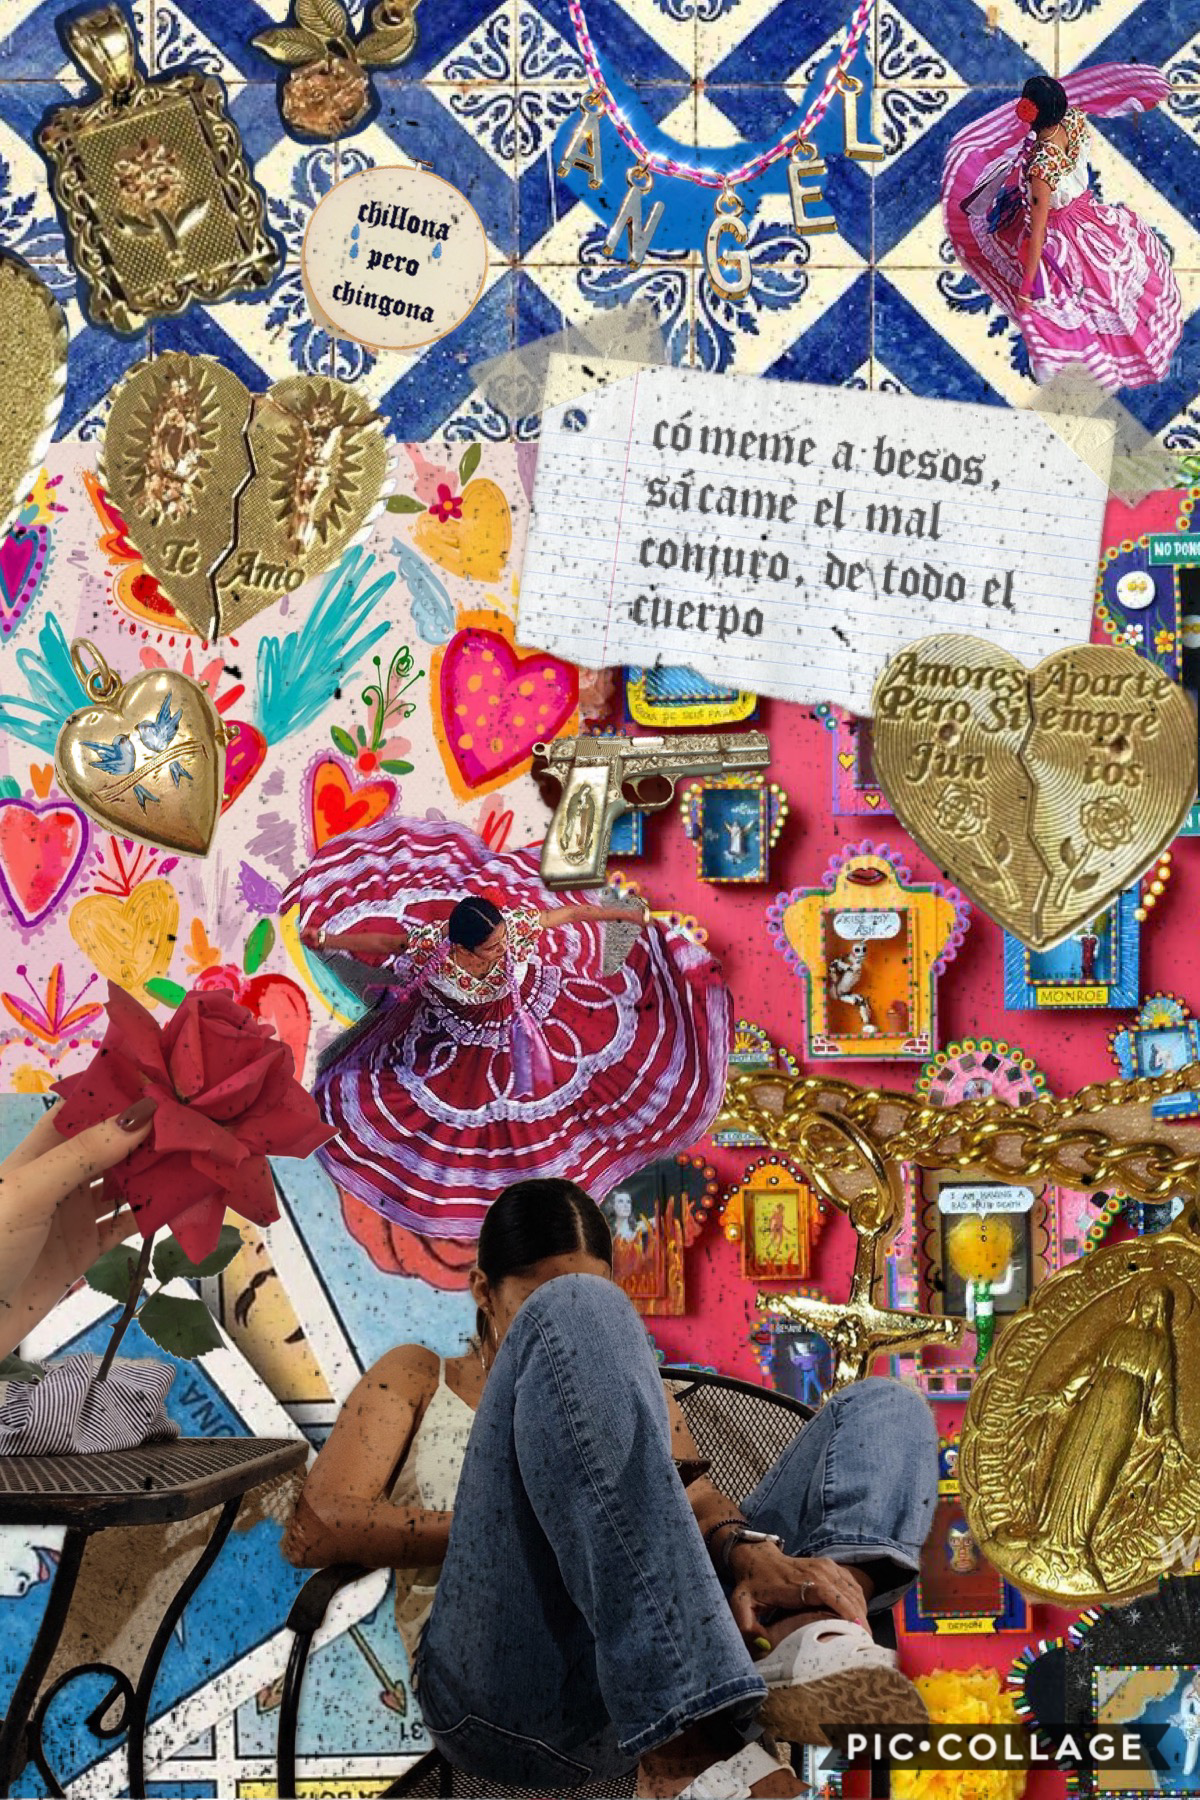 "definitivamente no hago suficientes posts en español 🙂🤦🏽♀️ pero no se preocupen, que por ahí lo arreglo ☺️😂 lyrics from ""monstruo"" by cami, in case you wanna give those Chilean vibes a listen 🇨🇱🤩 also remember to unclench your jaw 😌😉"